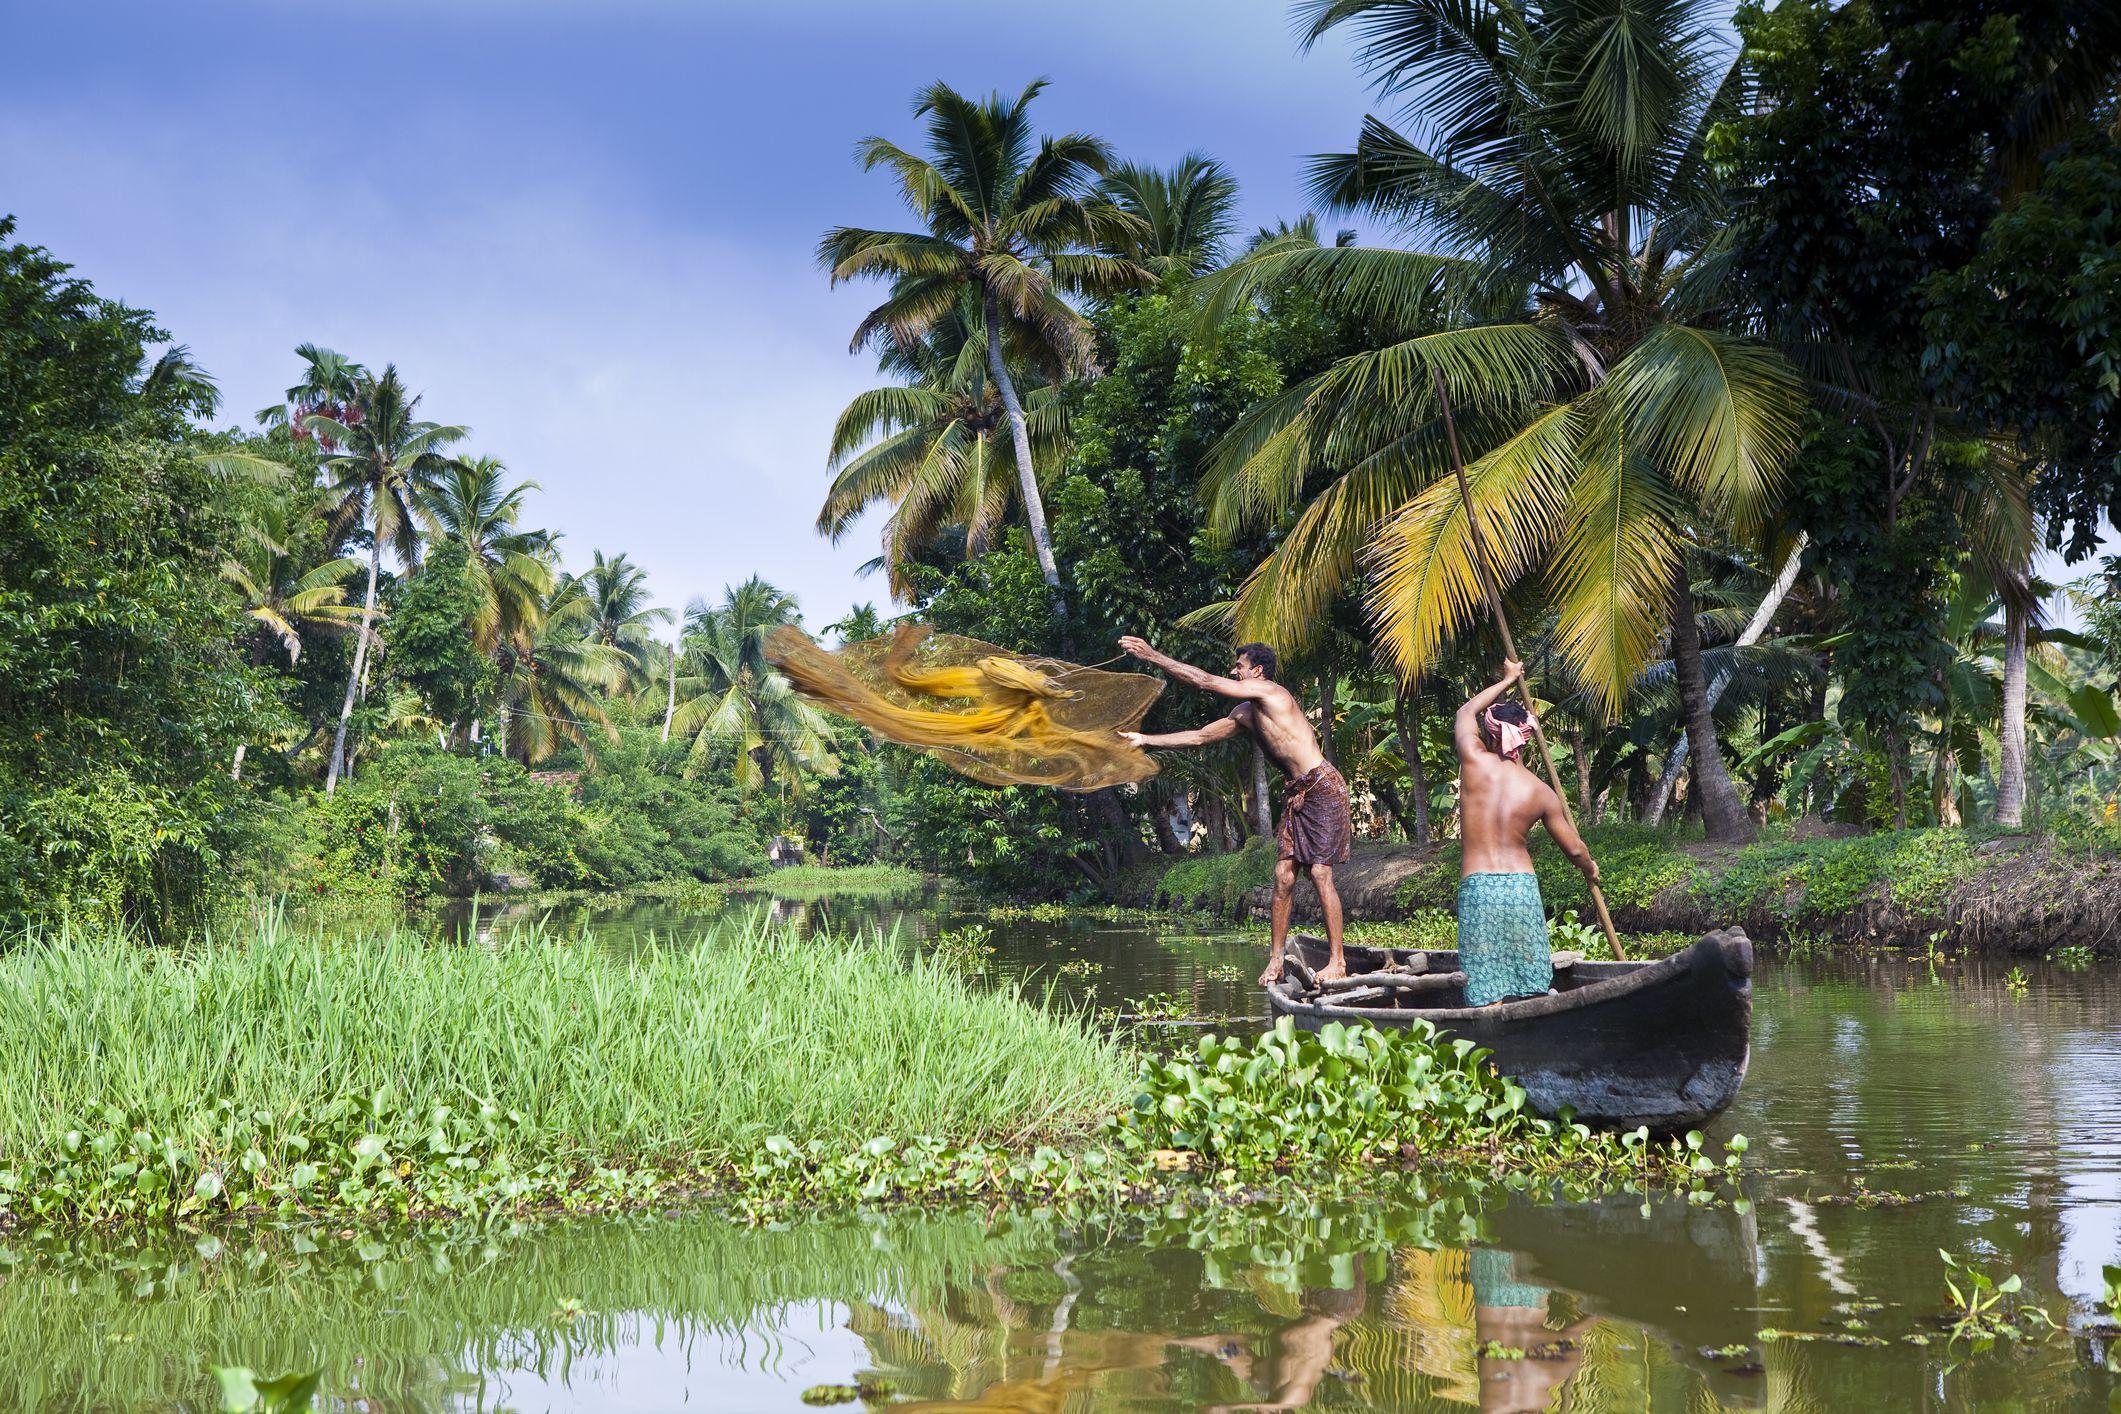 Villagers fishing in backwater canals around Kumarakom